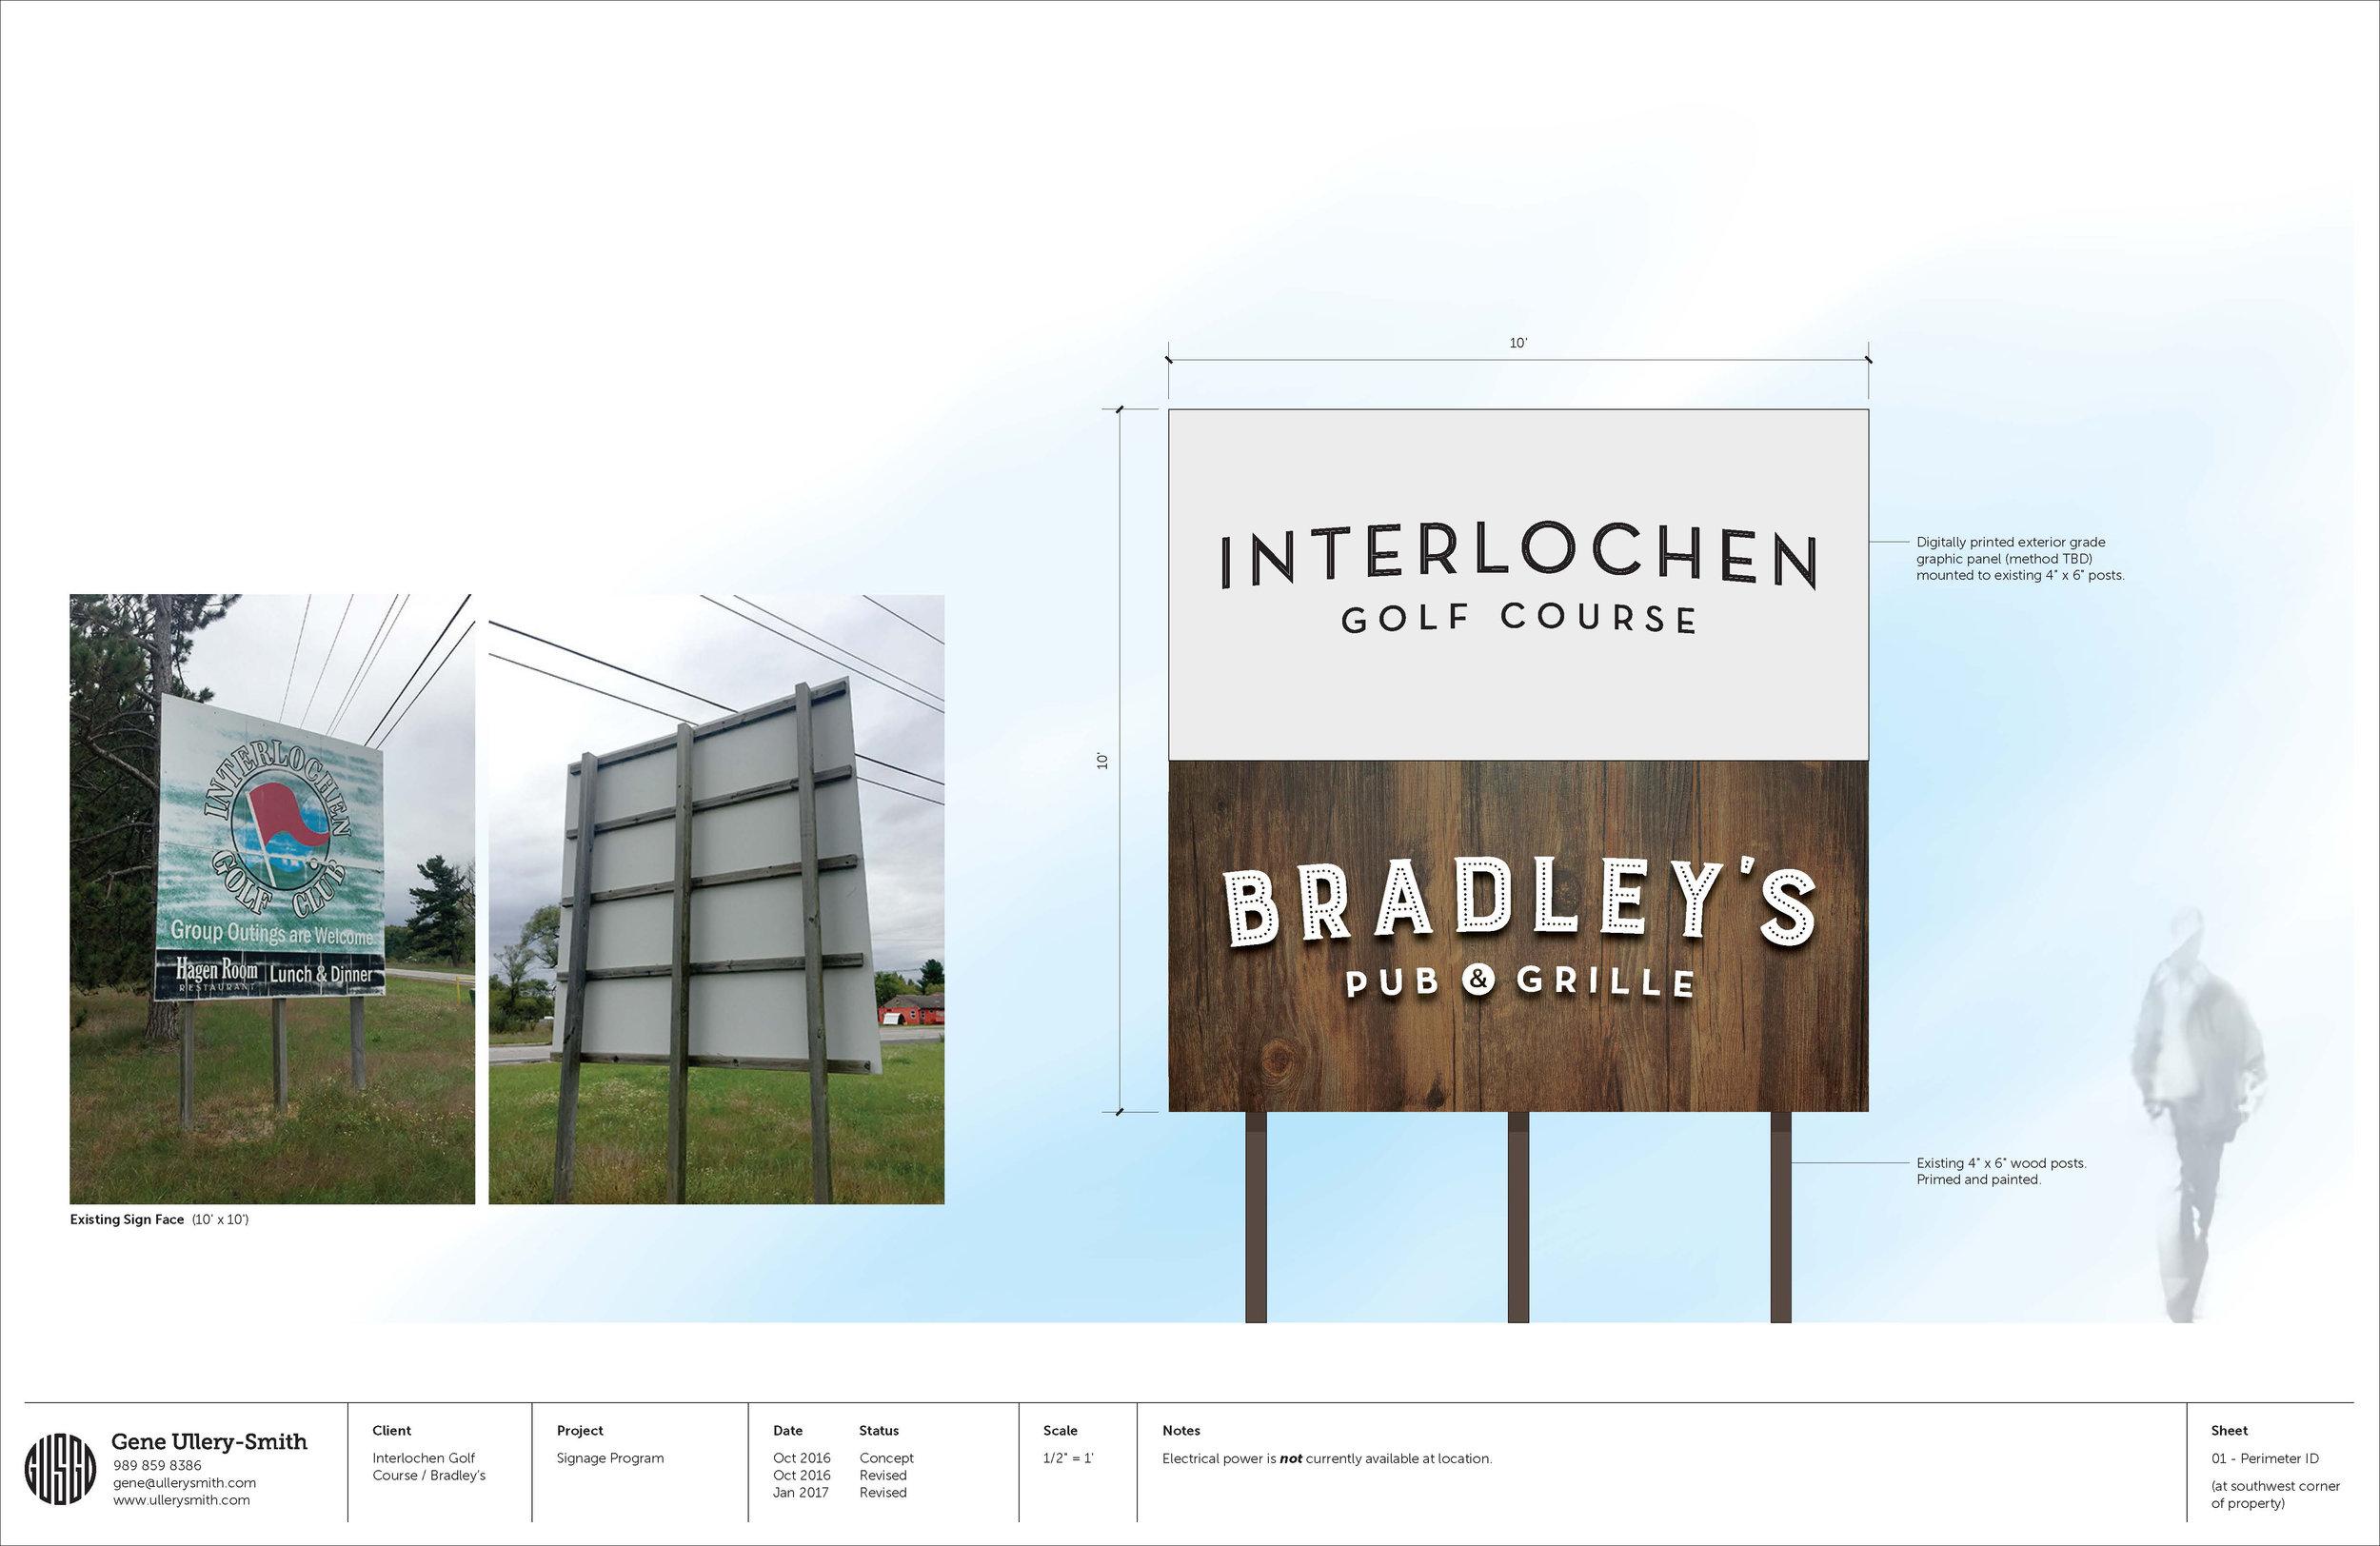 IGC_Bradley's_SignProgram_01042017_Page_2.jpg